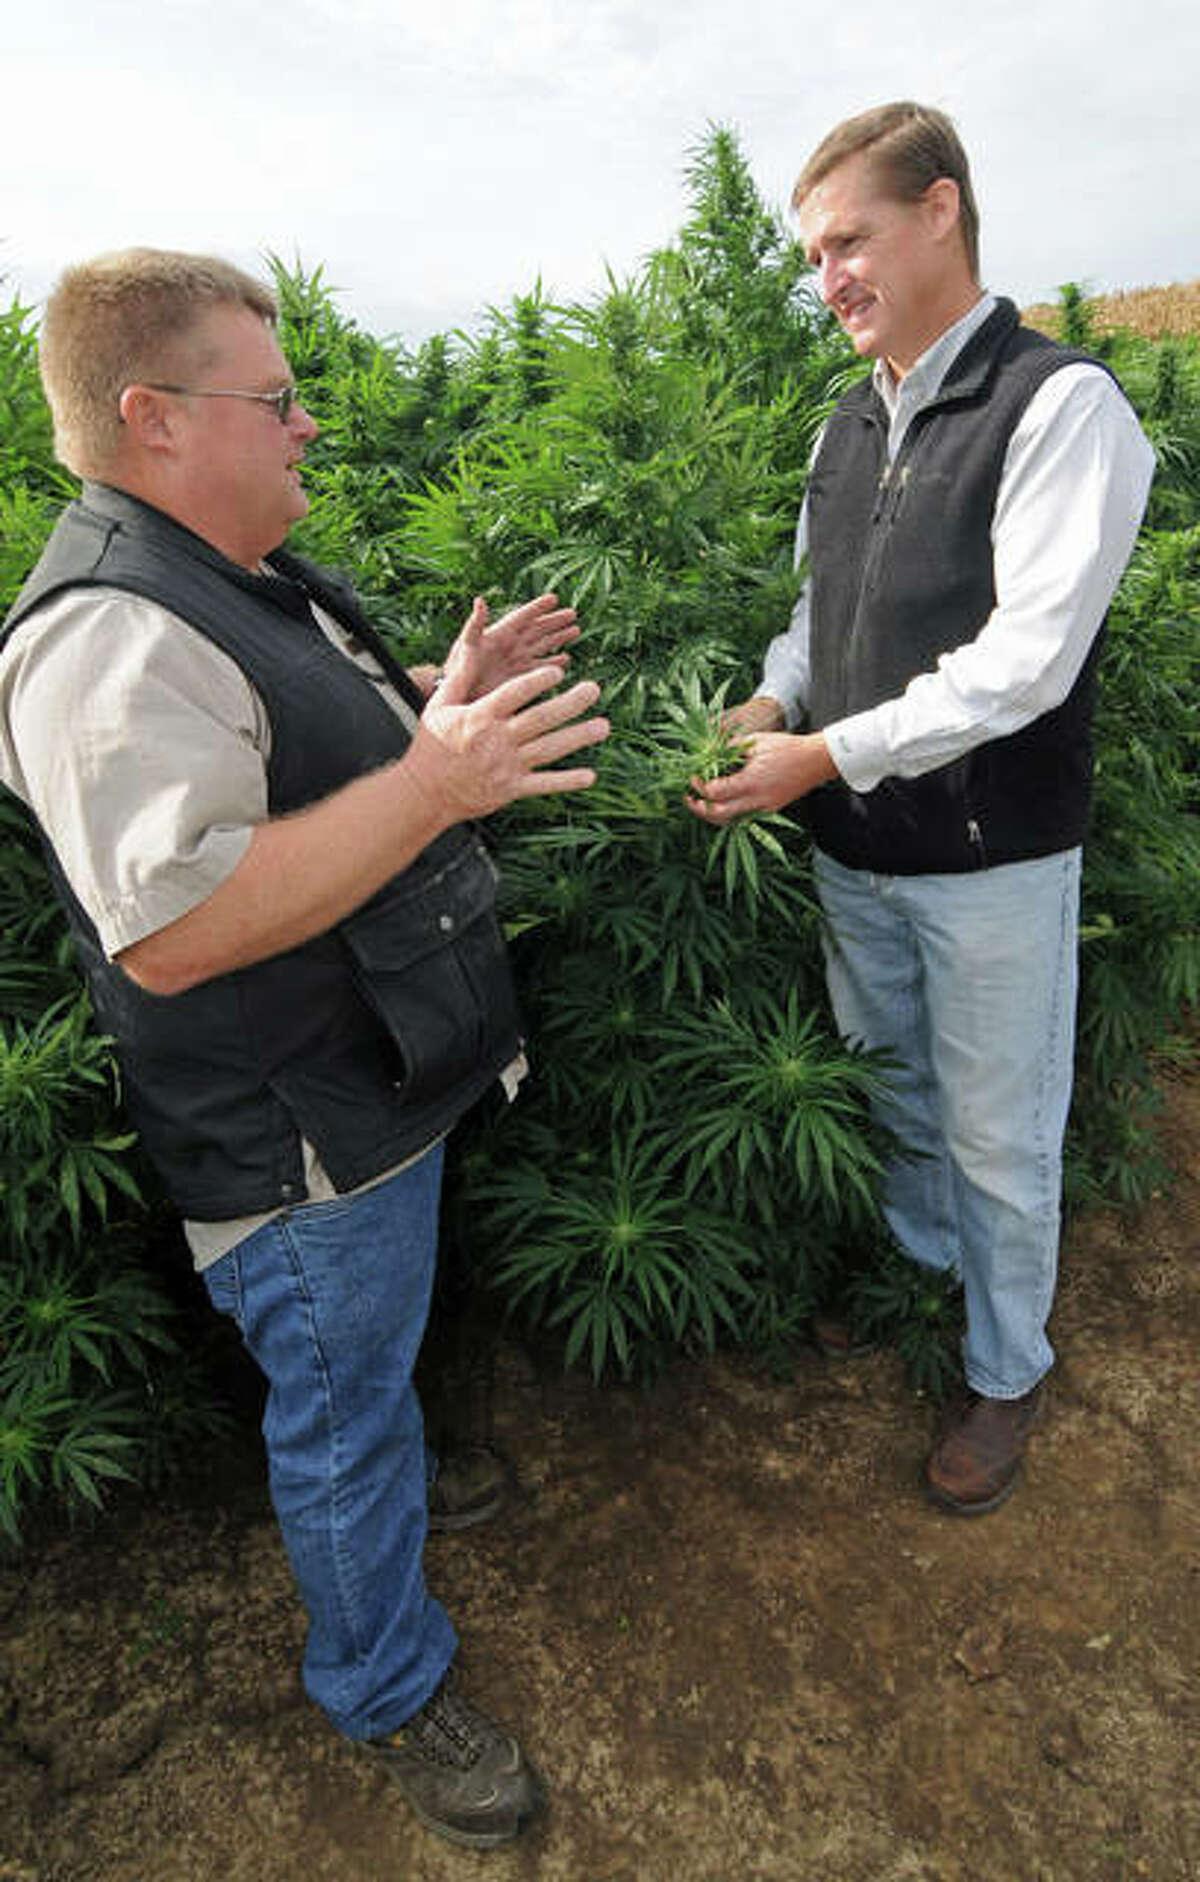 Warren County farmer Andy Huston, left, discusses the progress of his industrial hemp crop with Western Illinois University School of Agriculture Professor Win Phippen.